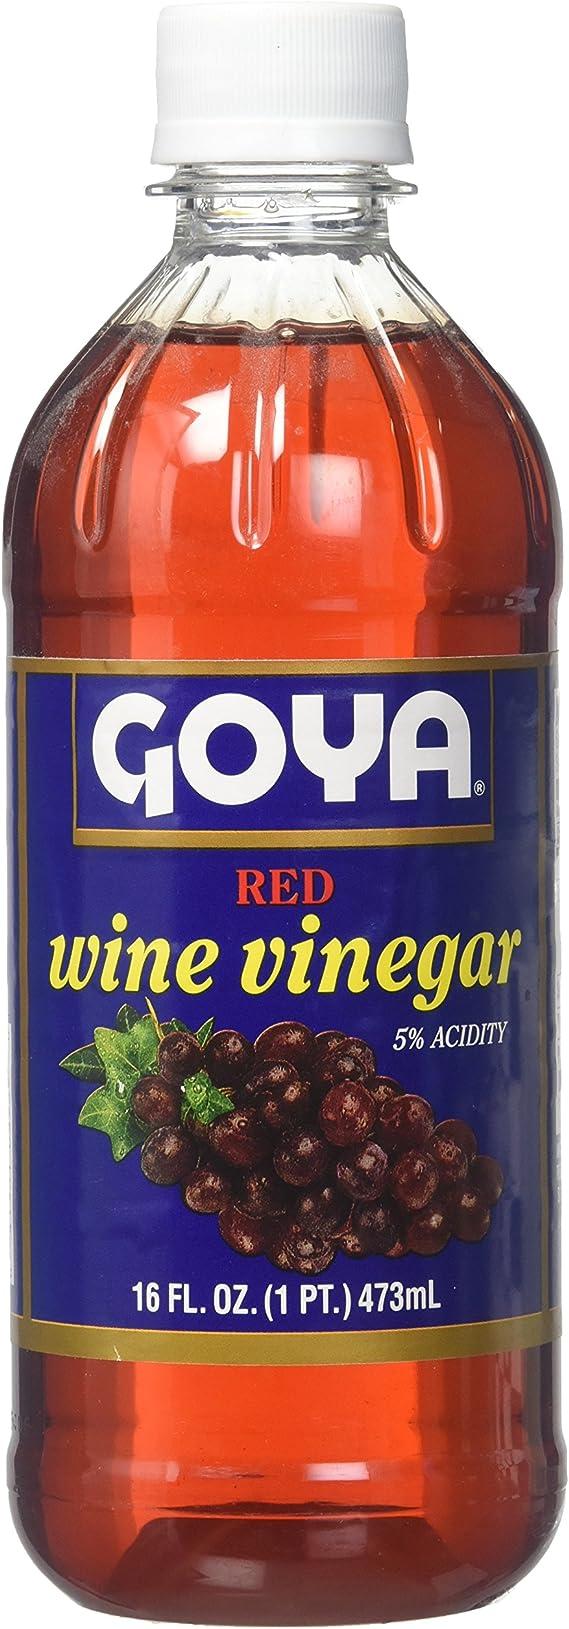 (1) Goya Red Wine Vinegar 16 oz